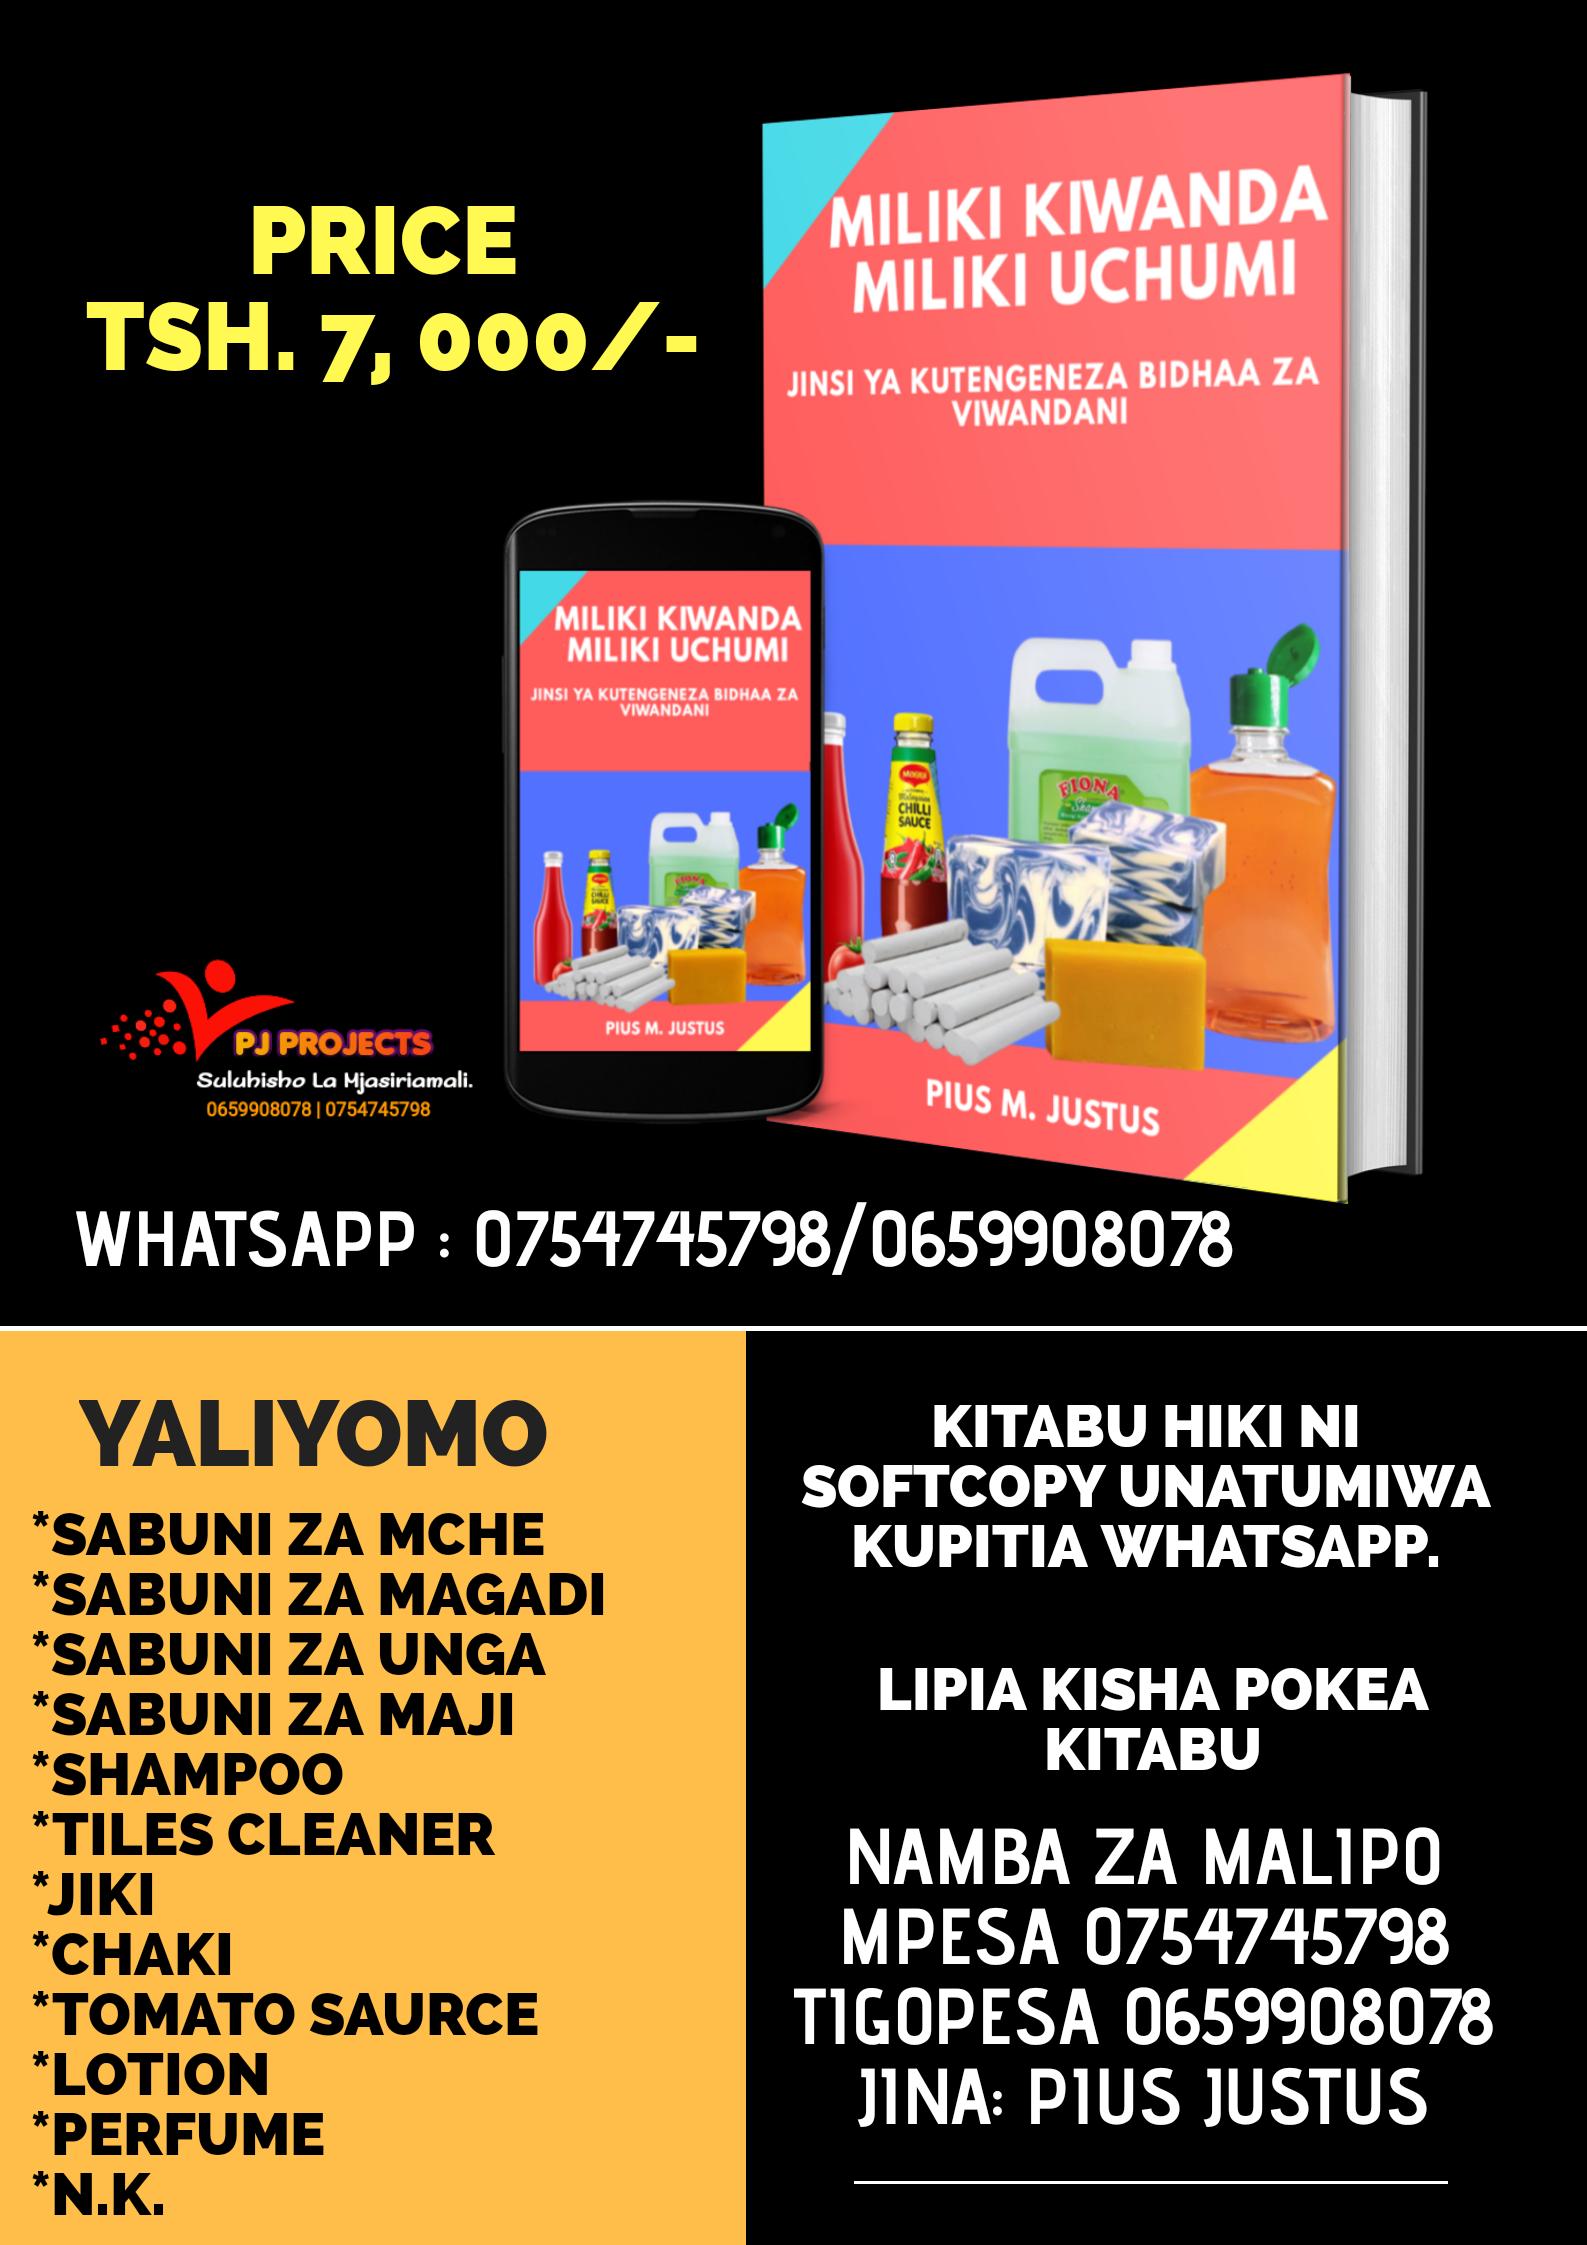 20201004_233359_0000